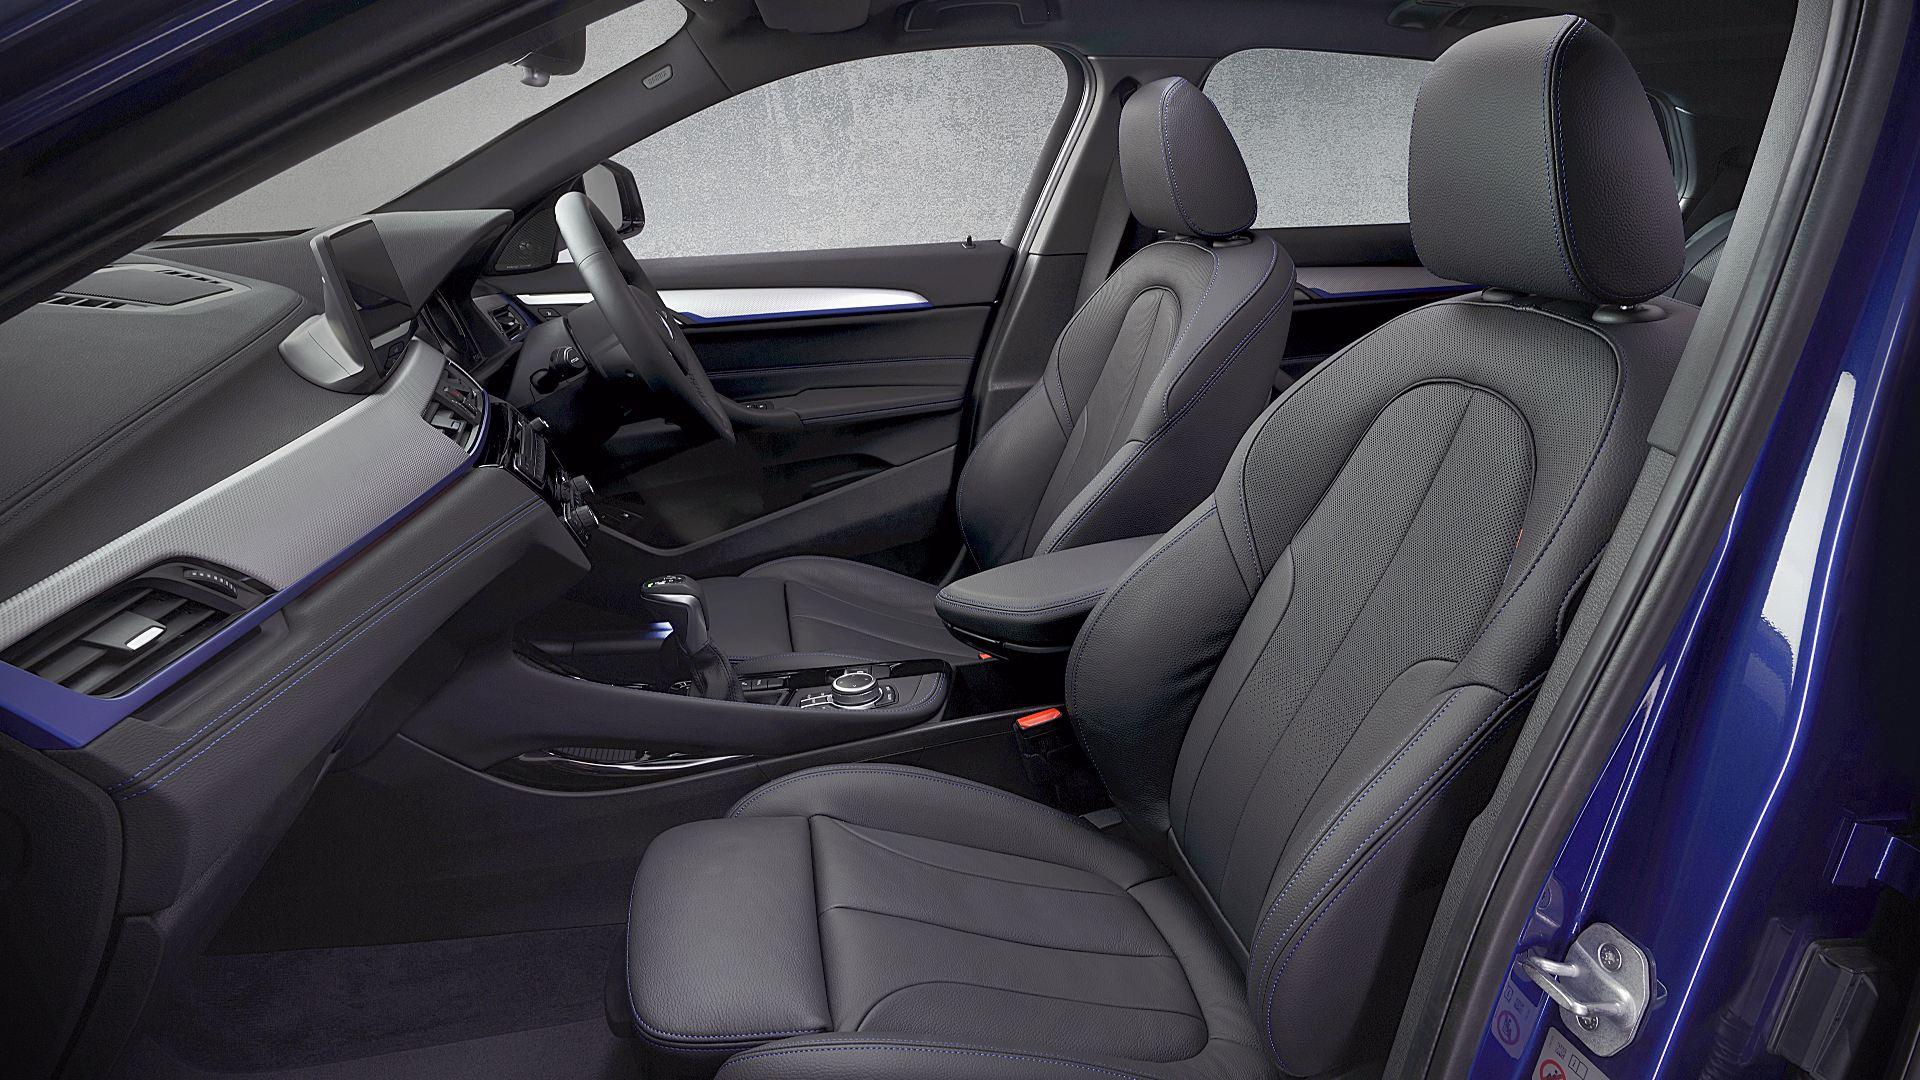 2021 BMW X2 Interior Inside